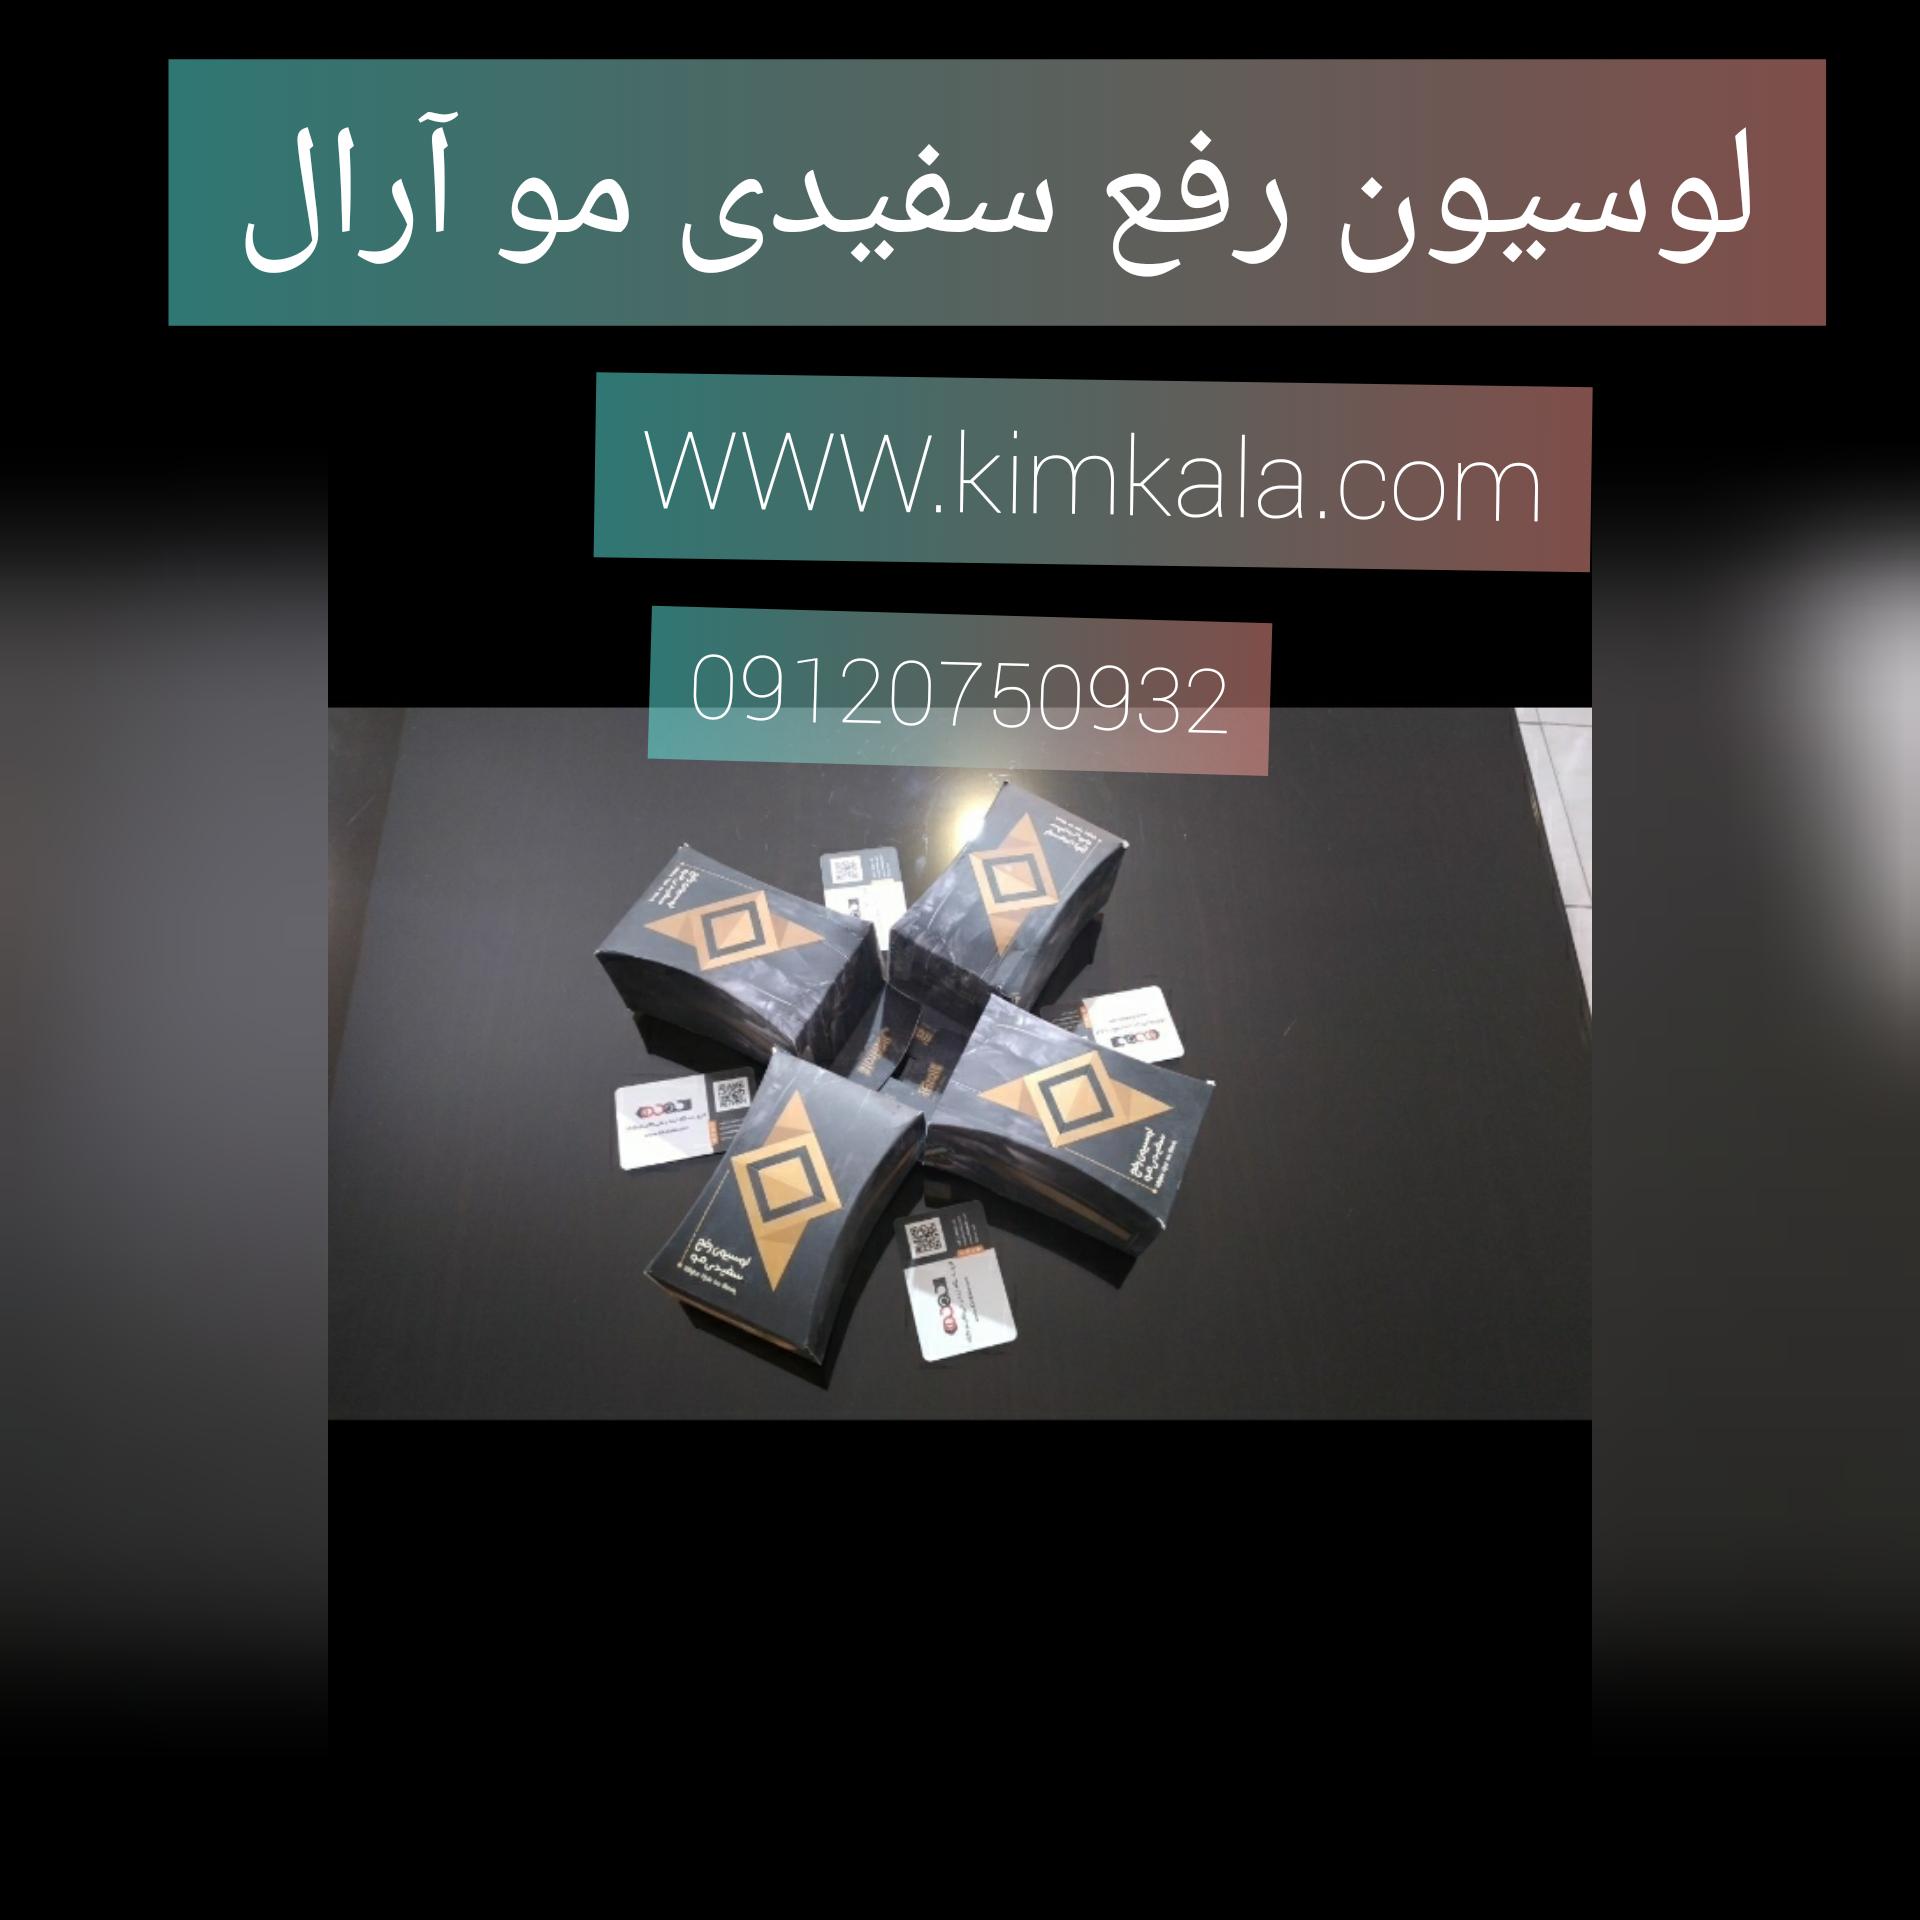 لوسیون رفع سفیدی مو آرال/09120750932/قیمت لوسیون